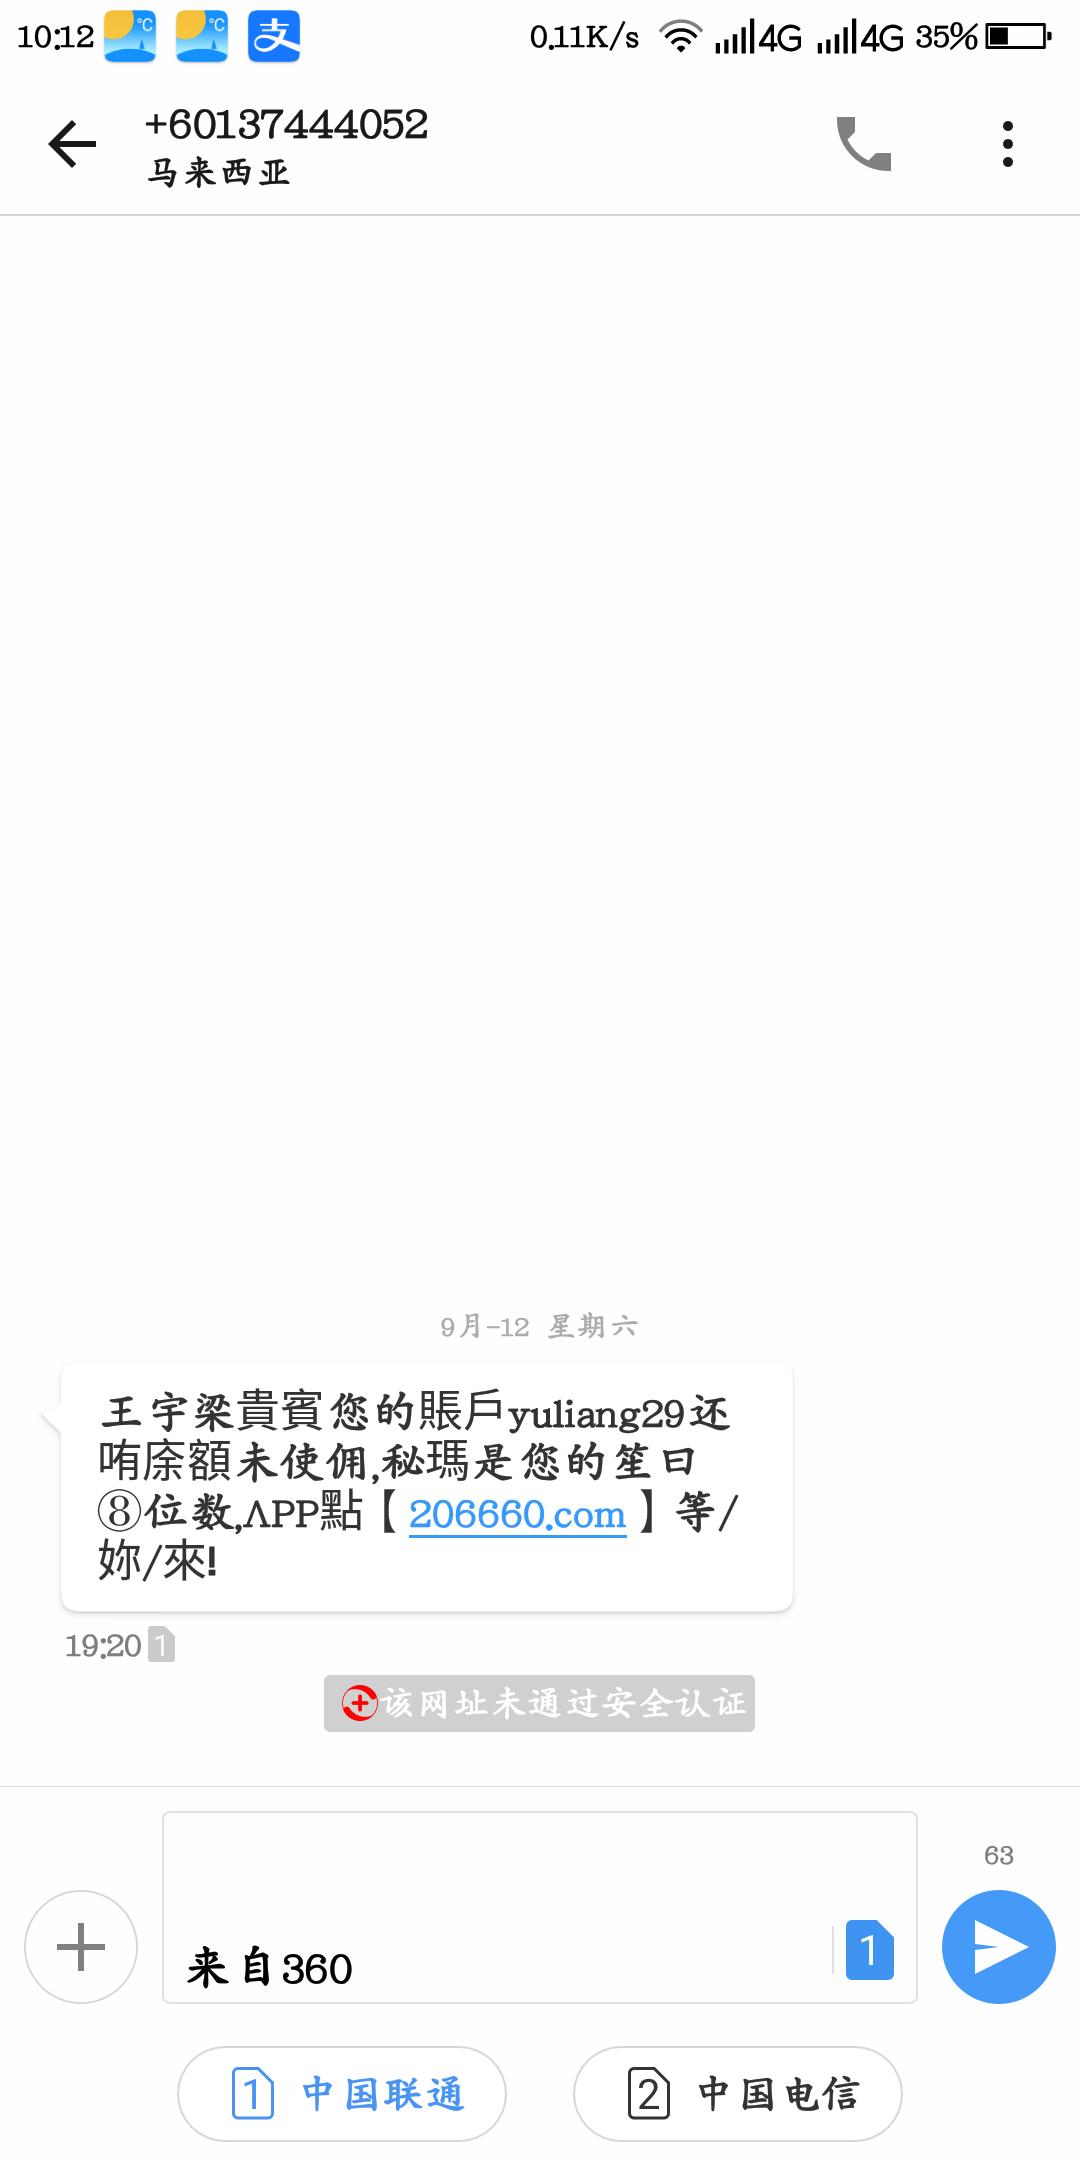 Screenshot_2020-10-10-10-12-24.png